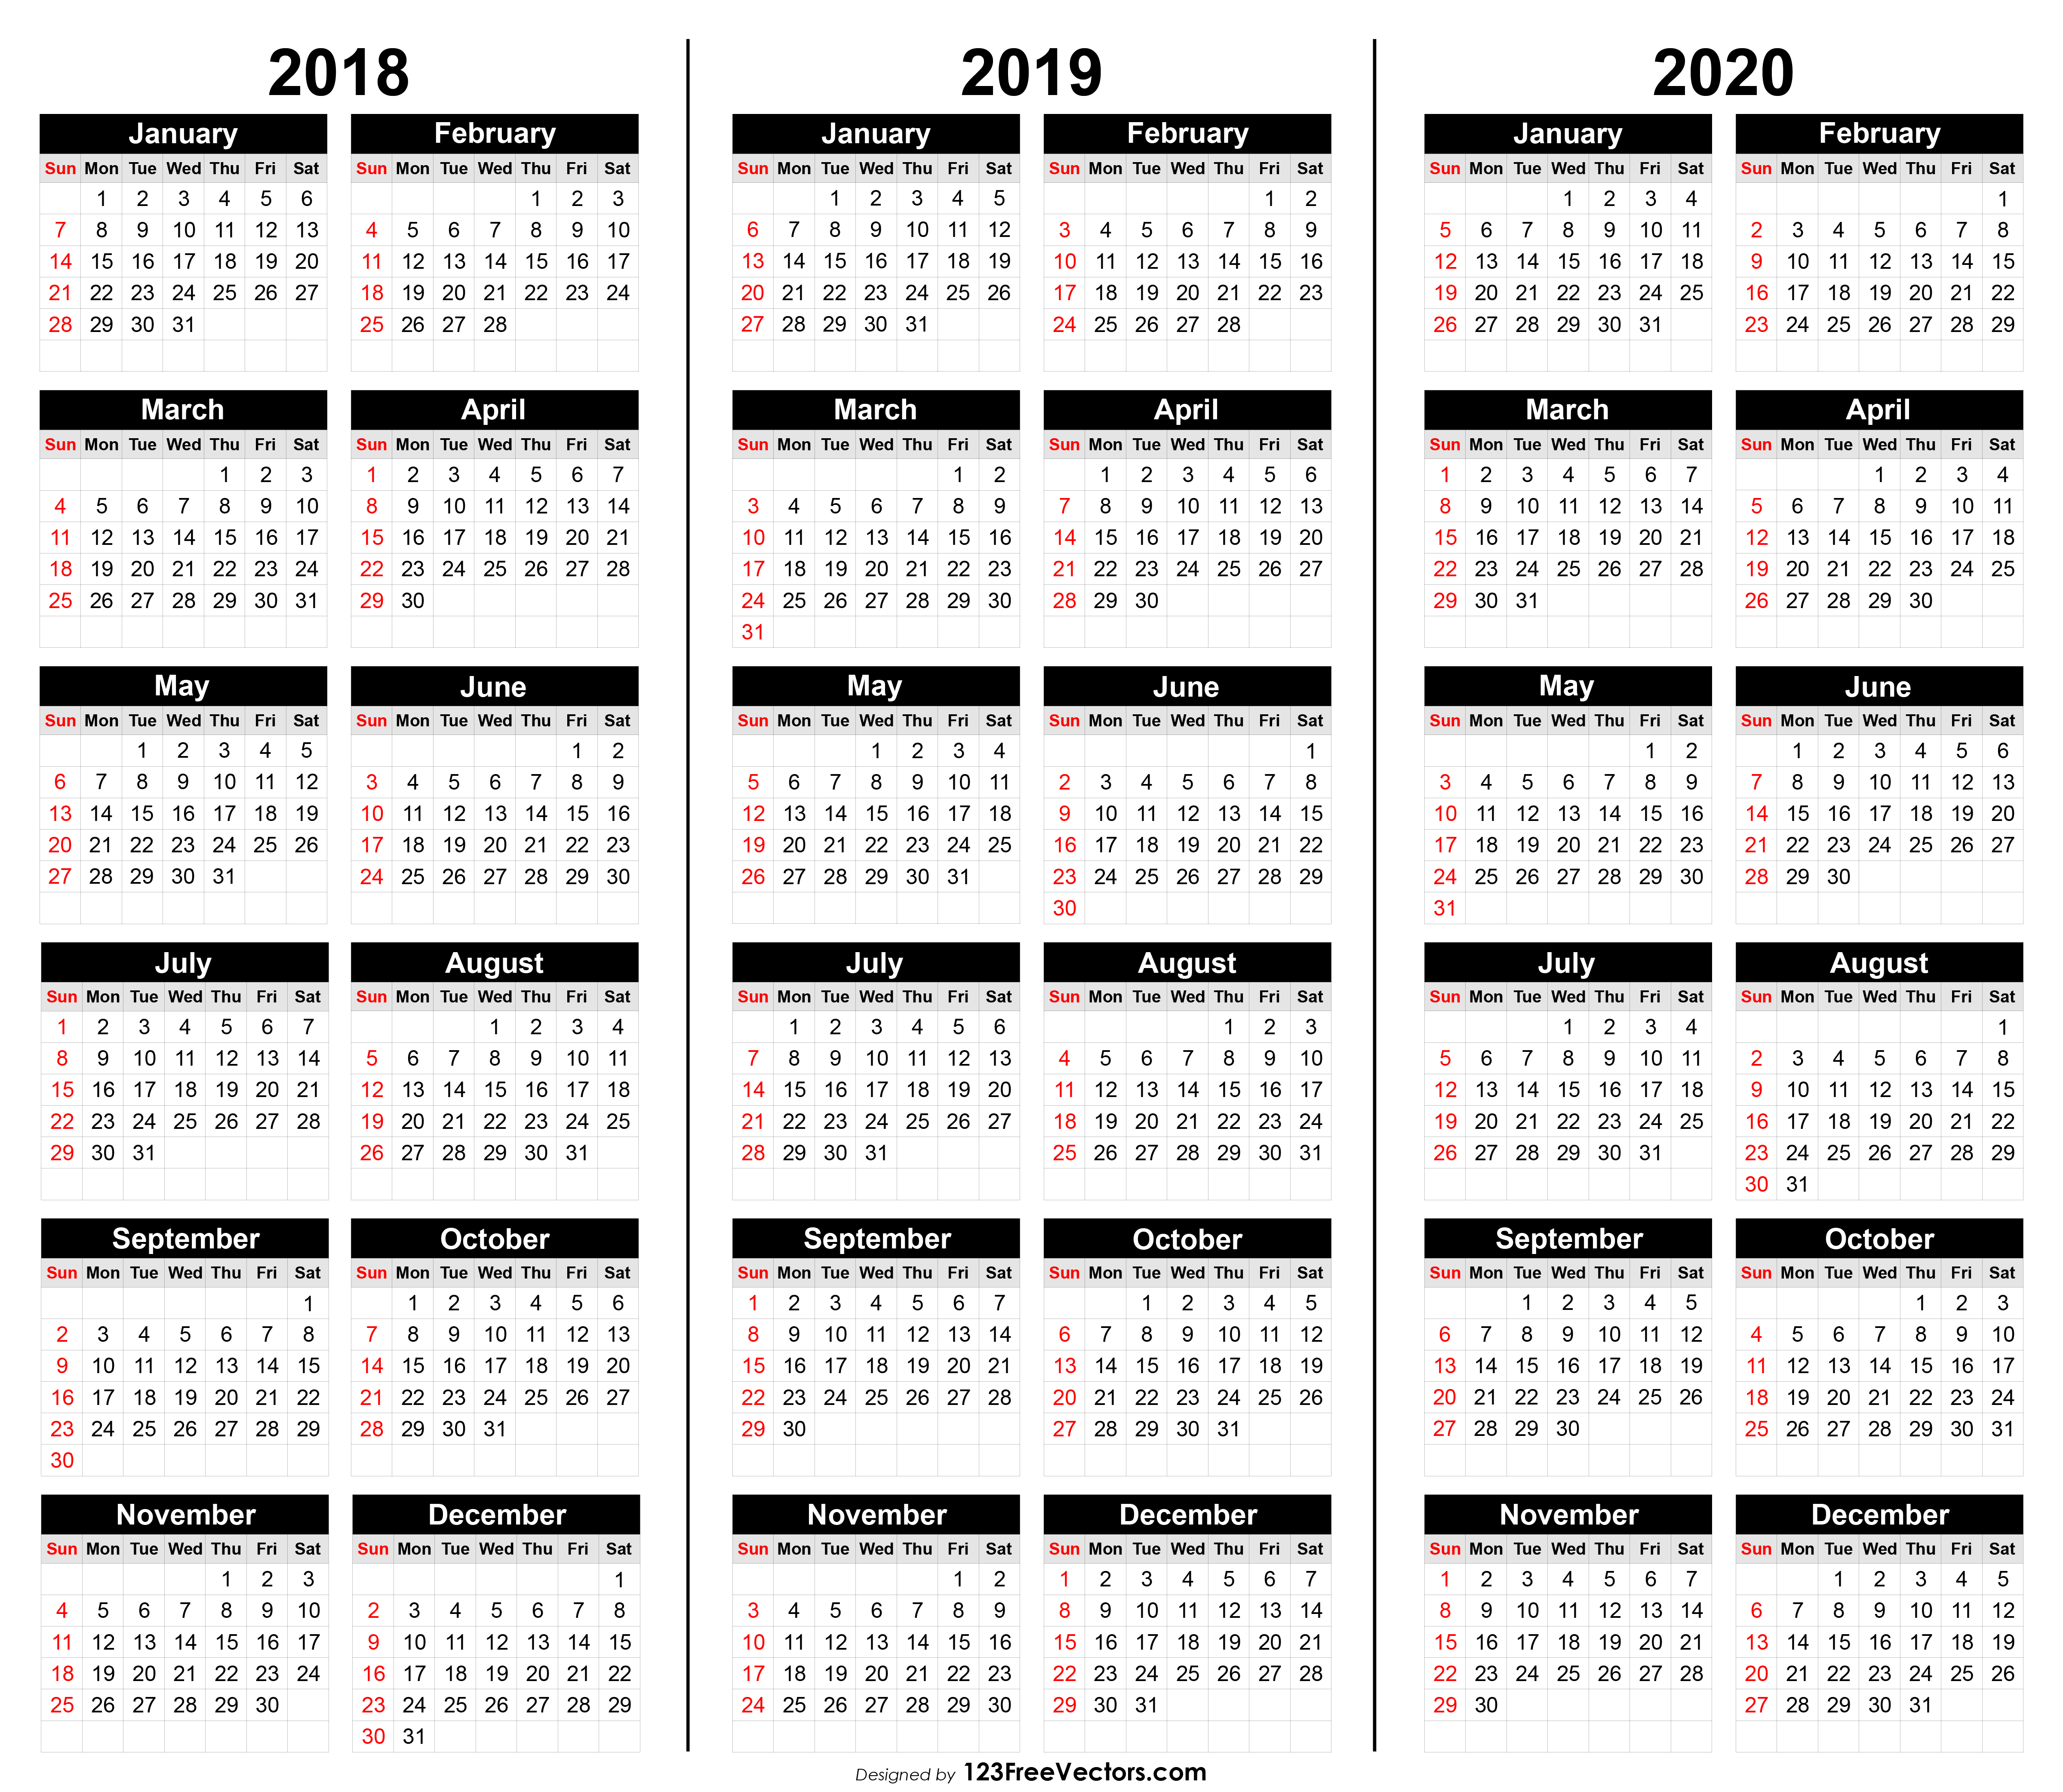 Free 3 Year Calendar 2018 2019 2020